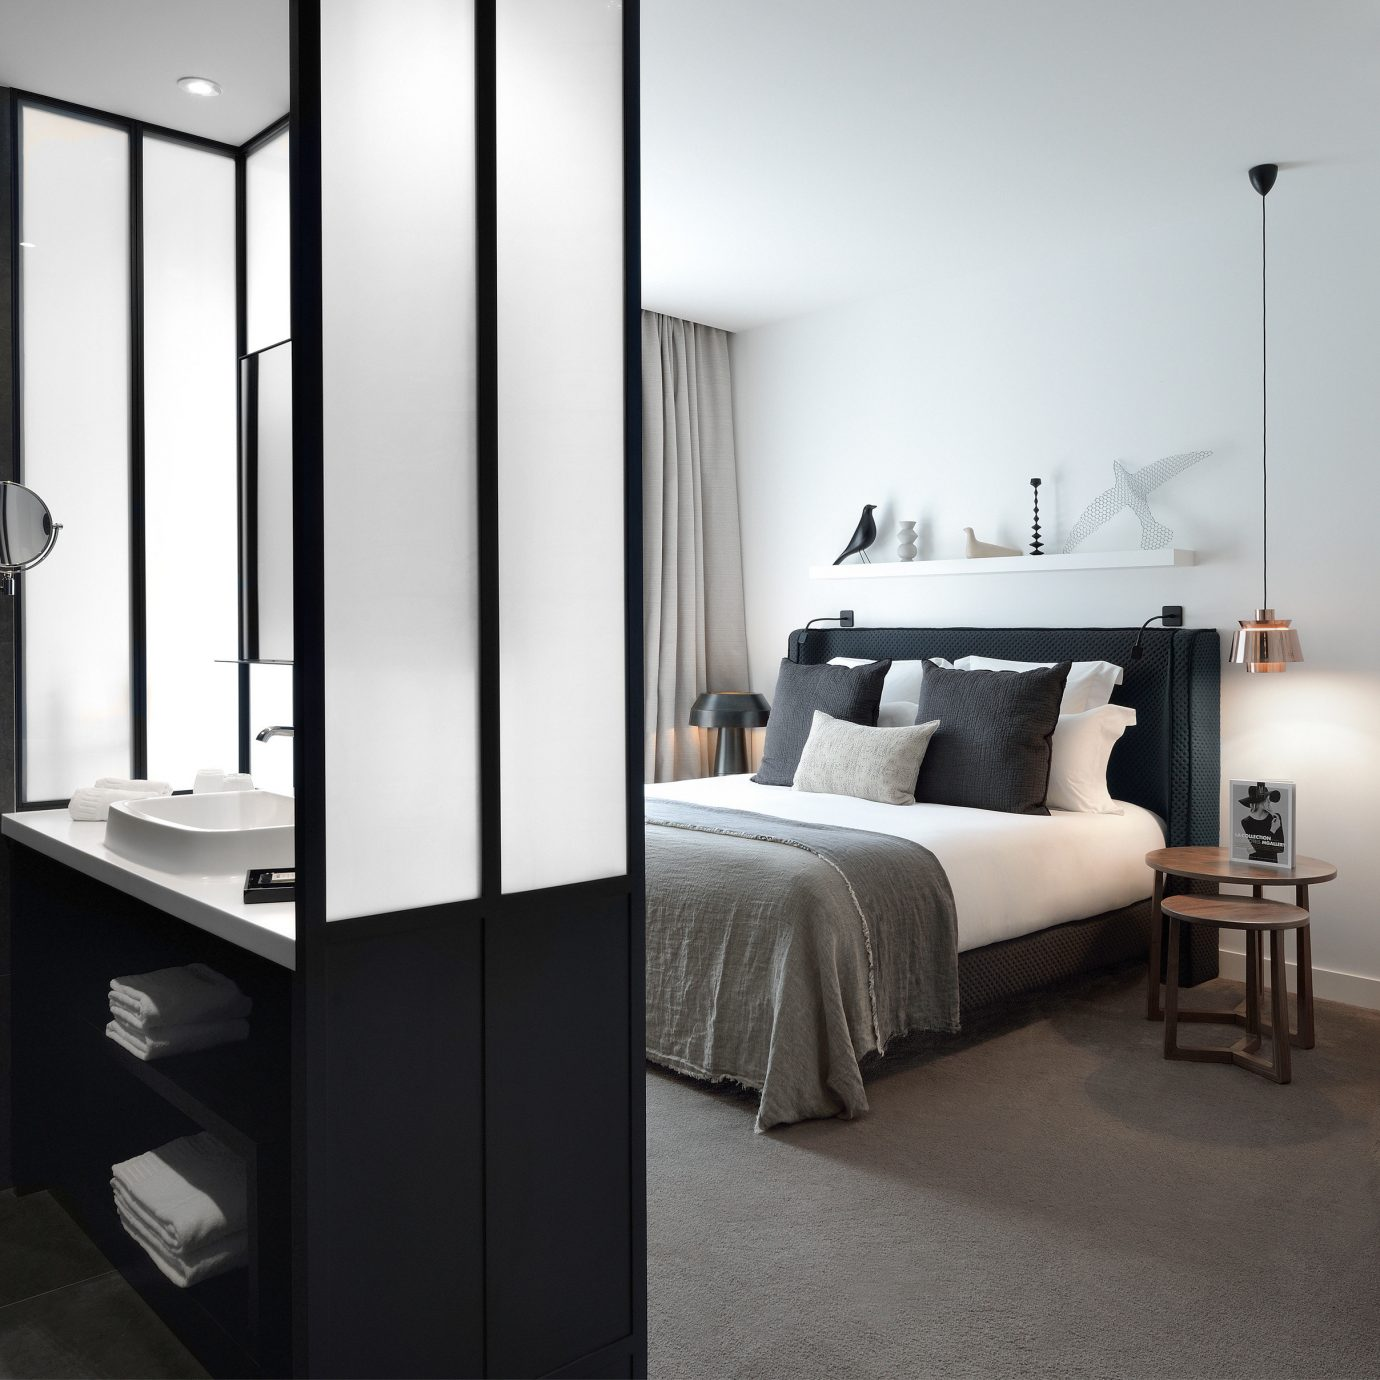 Bedroom Boutique Modern property home bathroom loft Suite